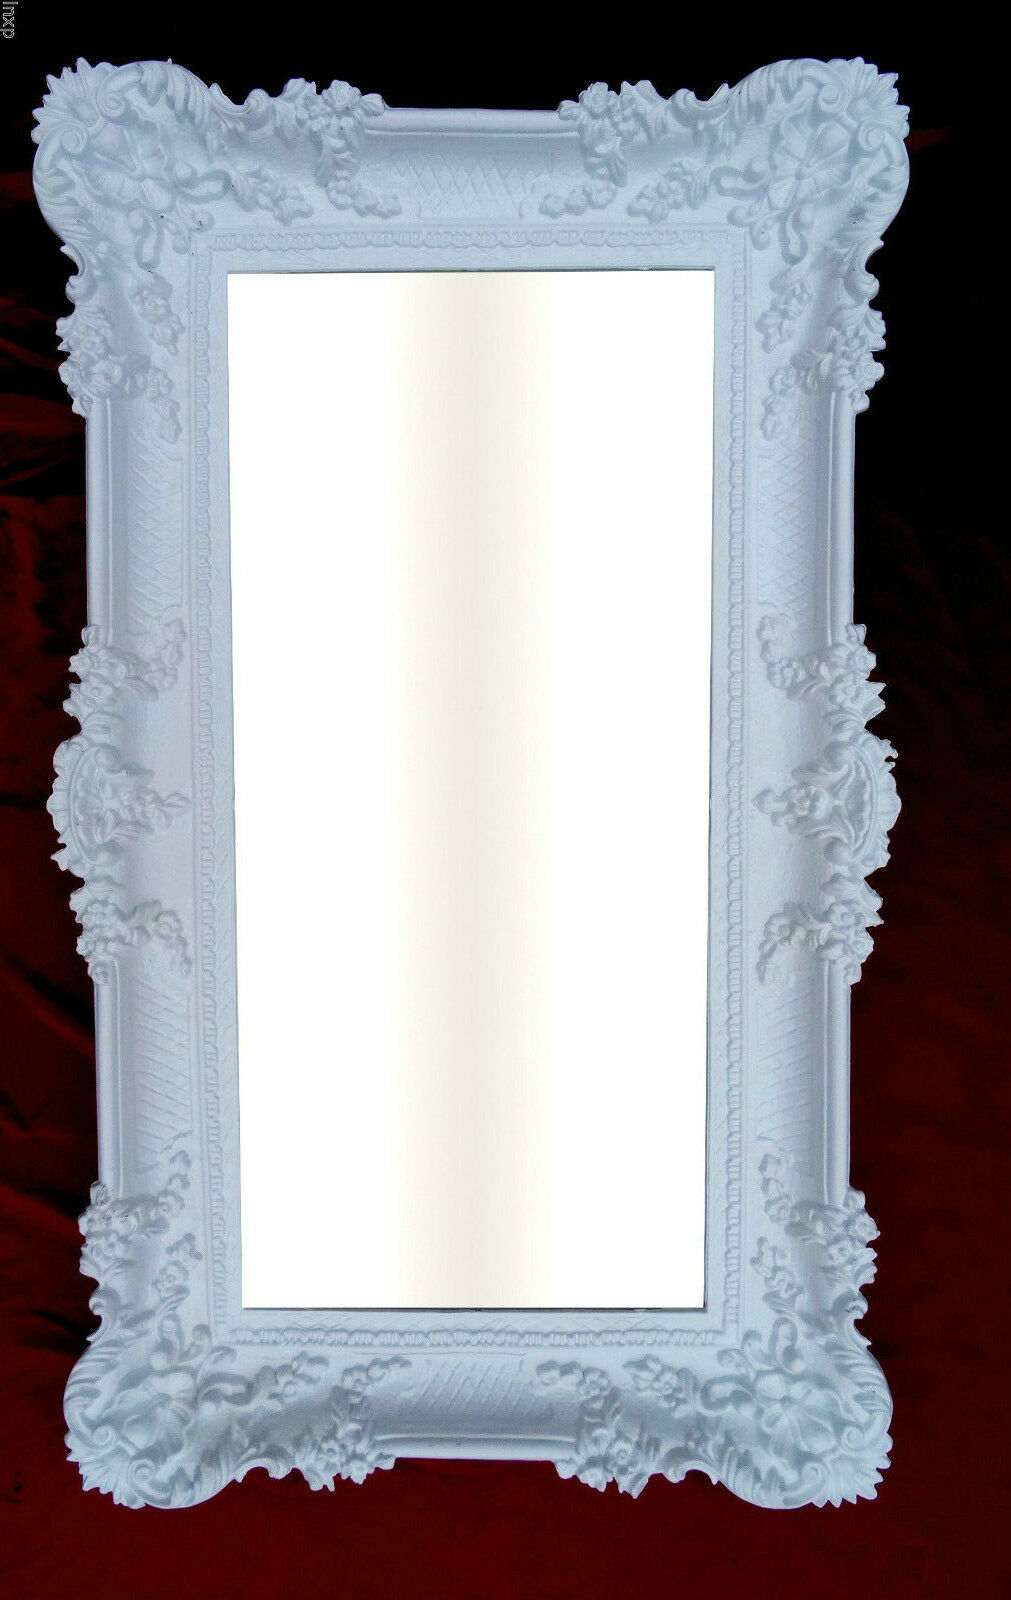 Miroir Mural Blanc Bad-FRISEUR-Bar Baroque Antique 97x57 Big salle de bain